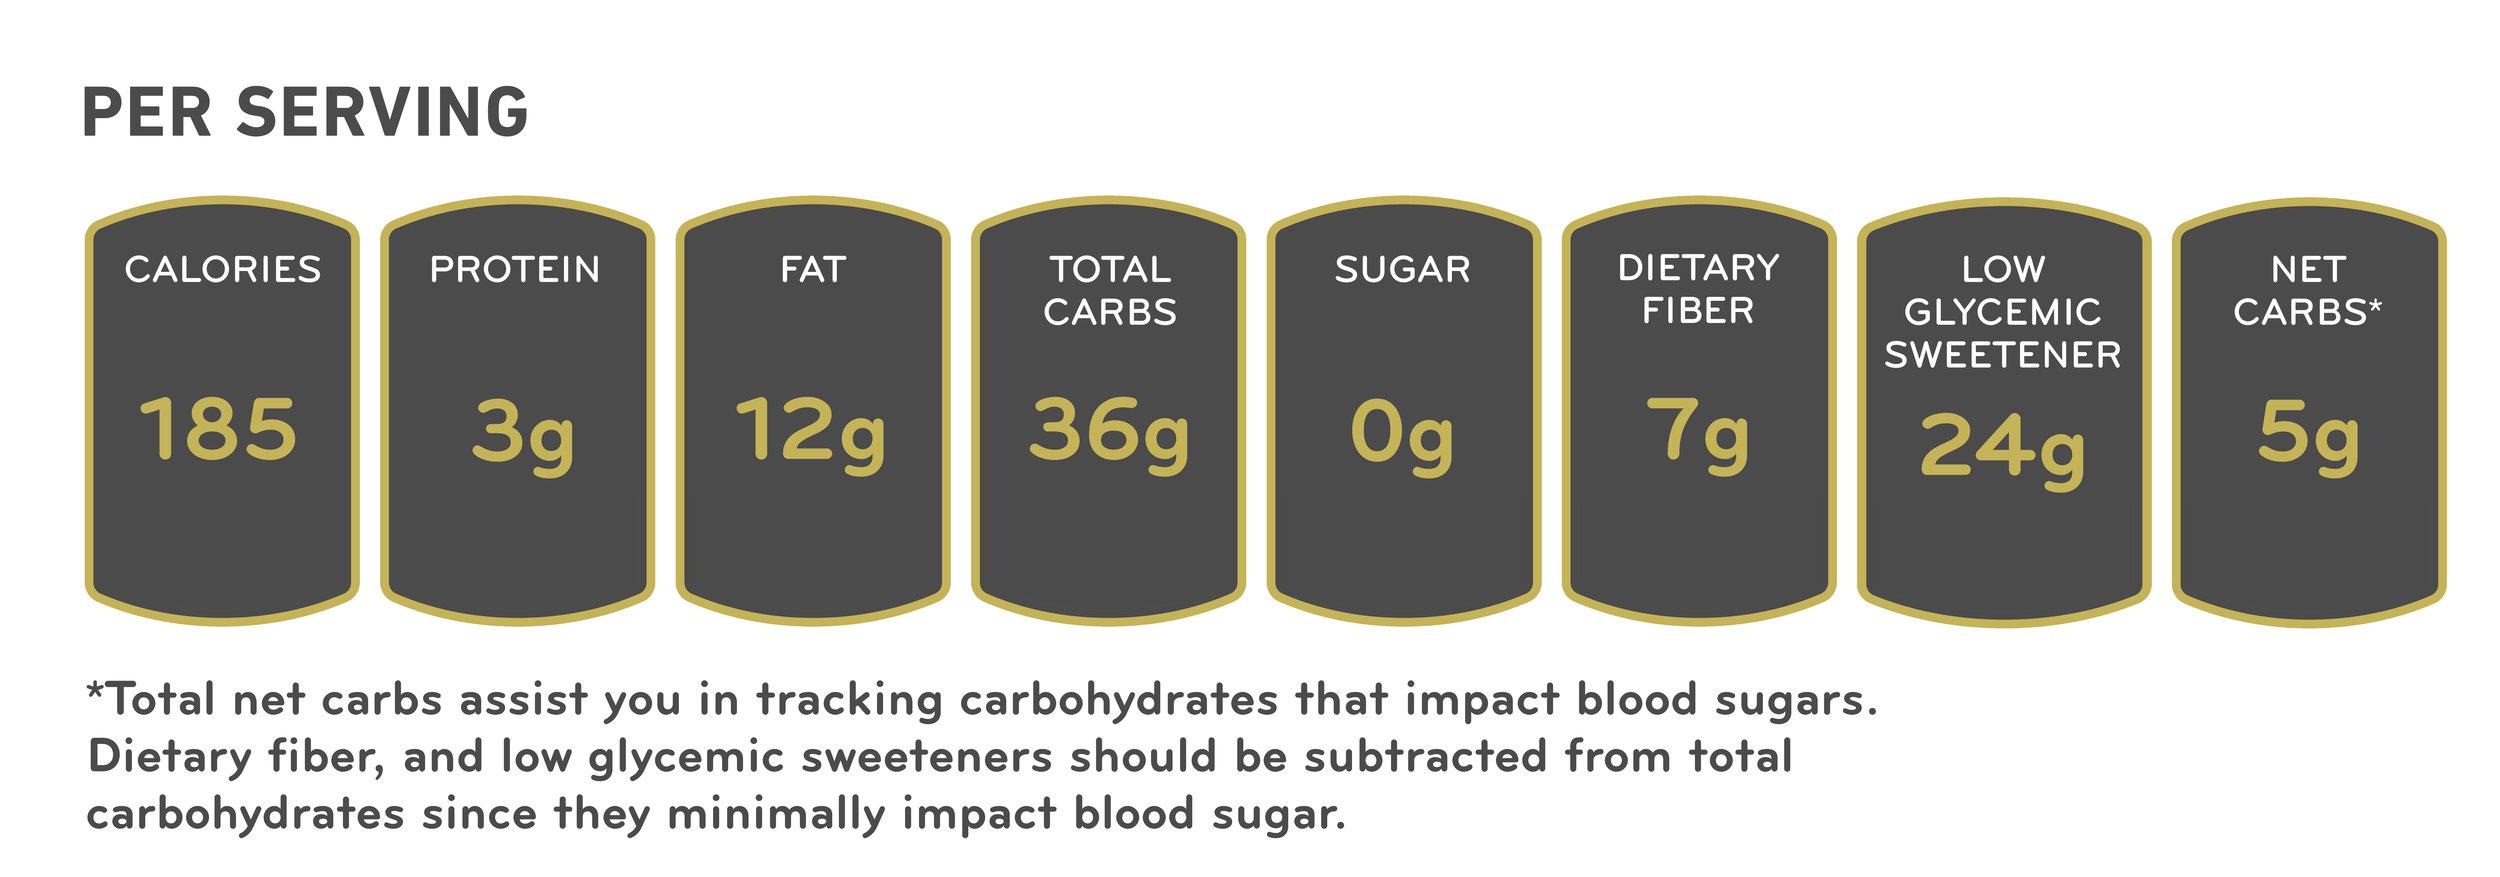 LOW CARB KETO AVOCADO PUDDING RECIPE NUTRITION FACTS.jpg